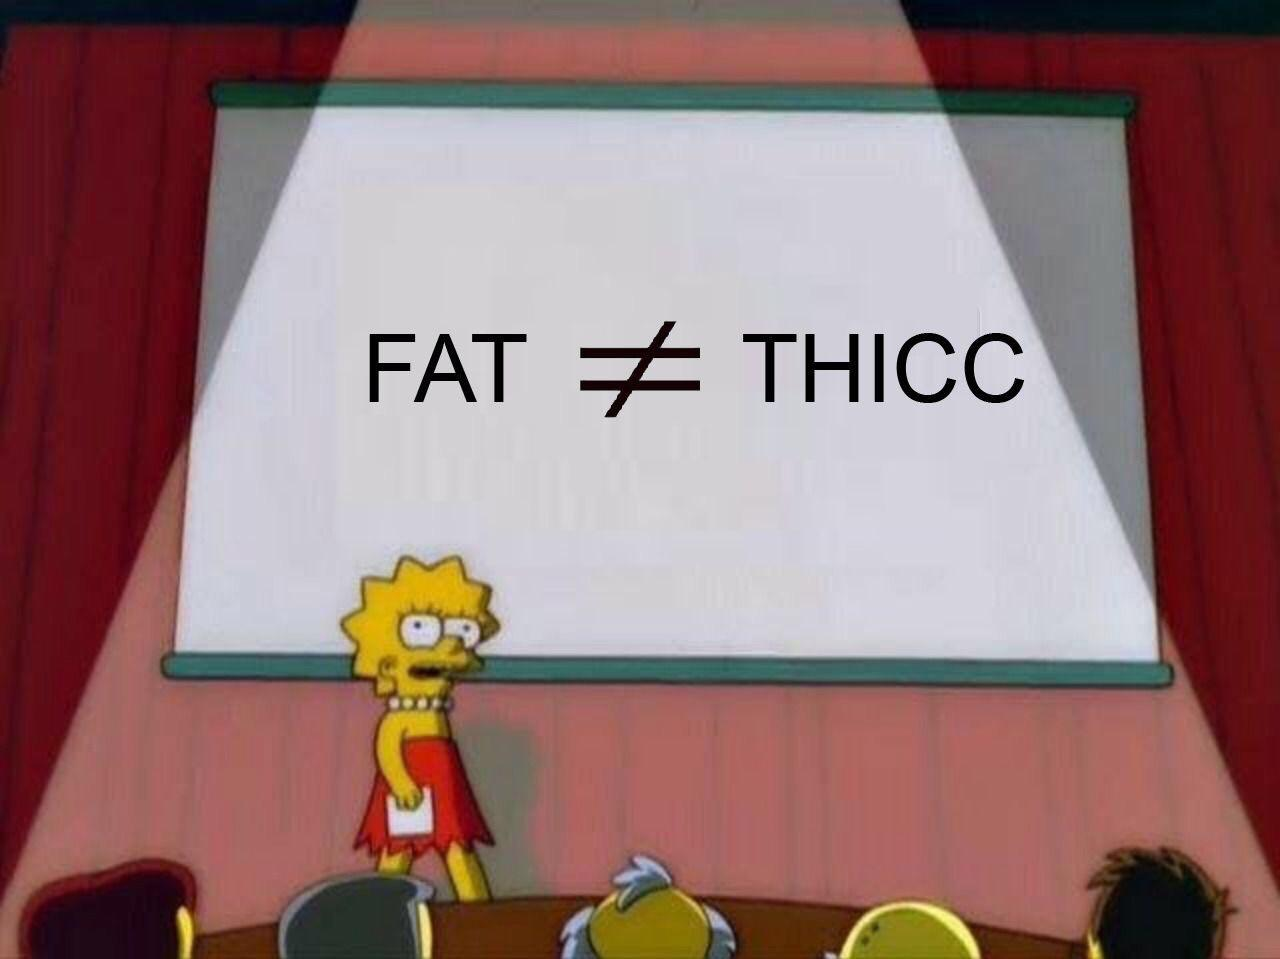 It had to be said - meme